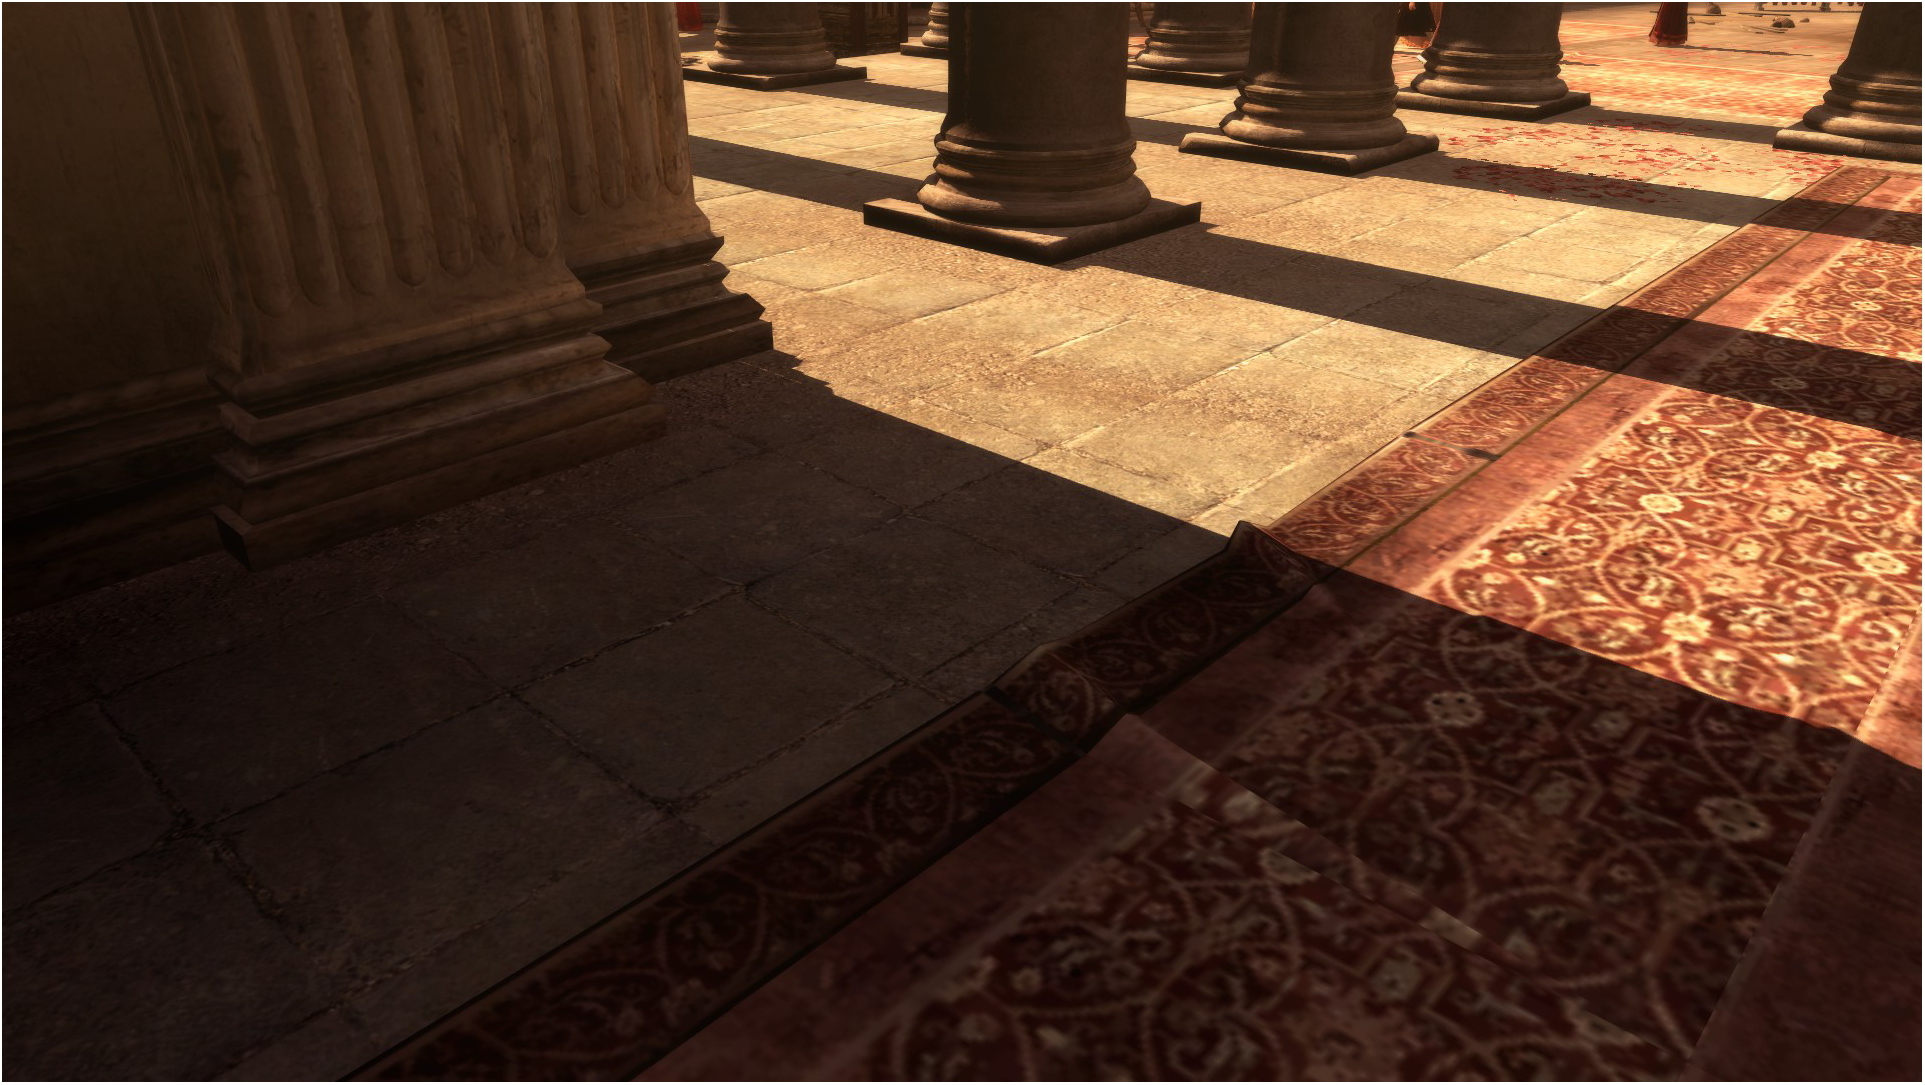 Assassin's Creed Brotherhood_0033_JTC.png